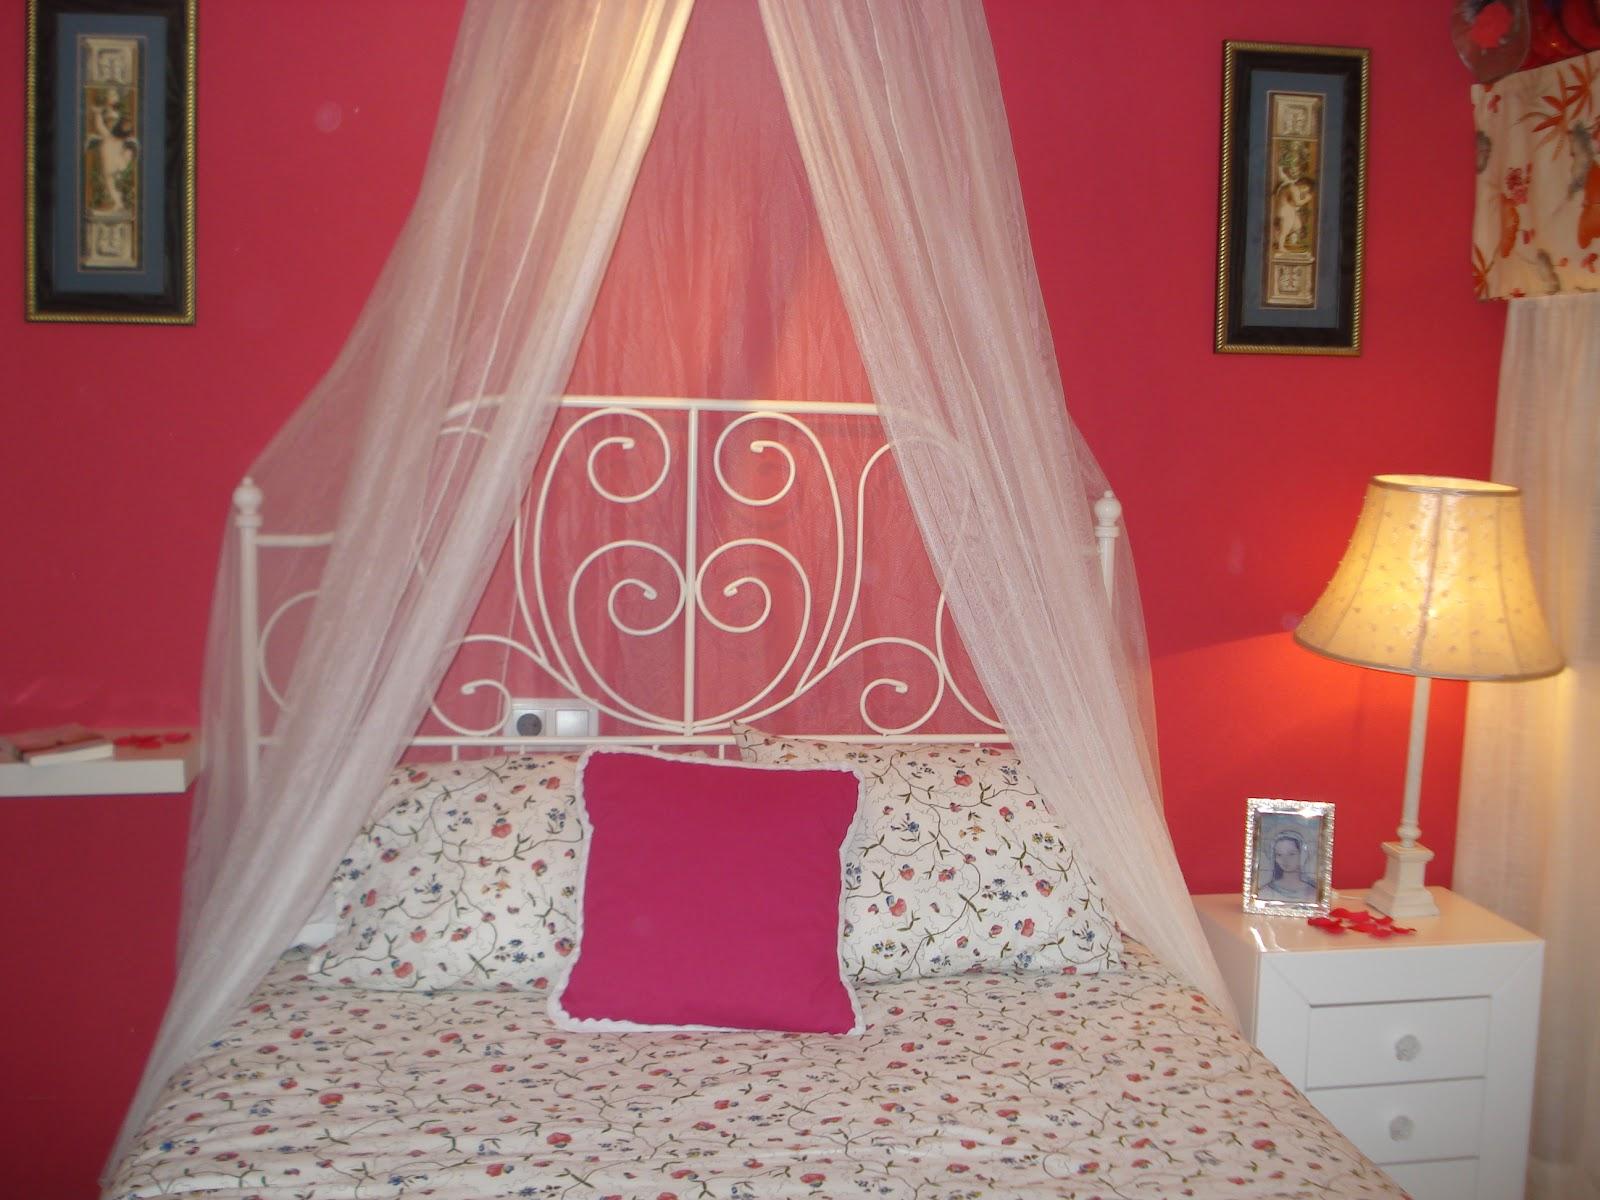 Las casas de pura dormitorio para chicas for Zara home cortinas dormitorio